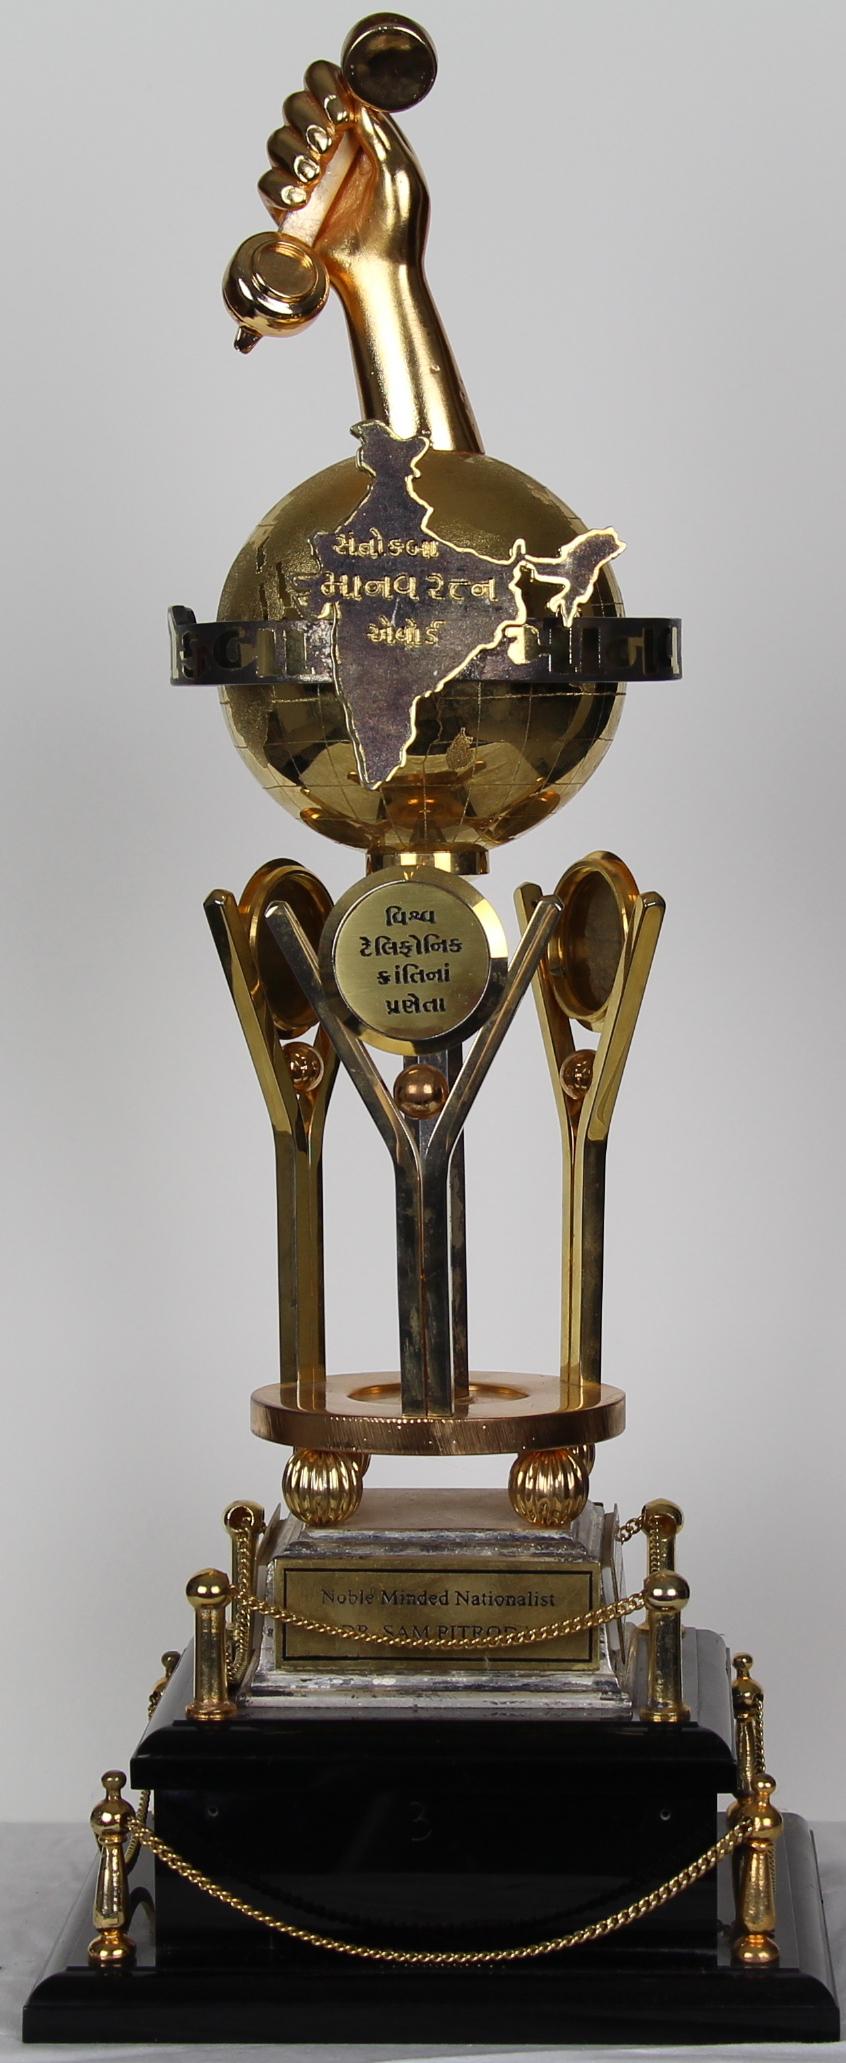 Santok-Ba Manav Ratna Award for World Telephonic Revolution & Noble-Minded Nationalist